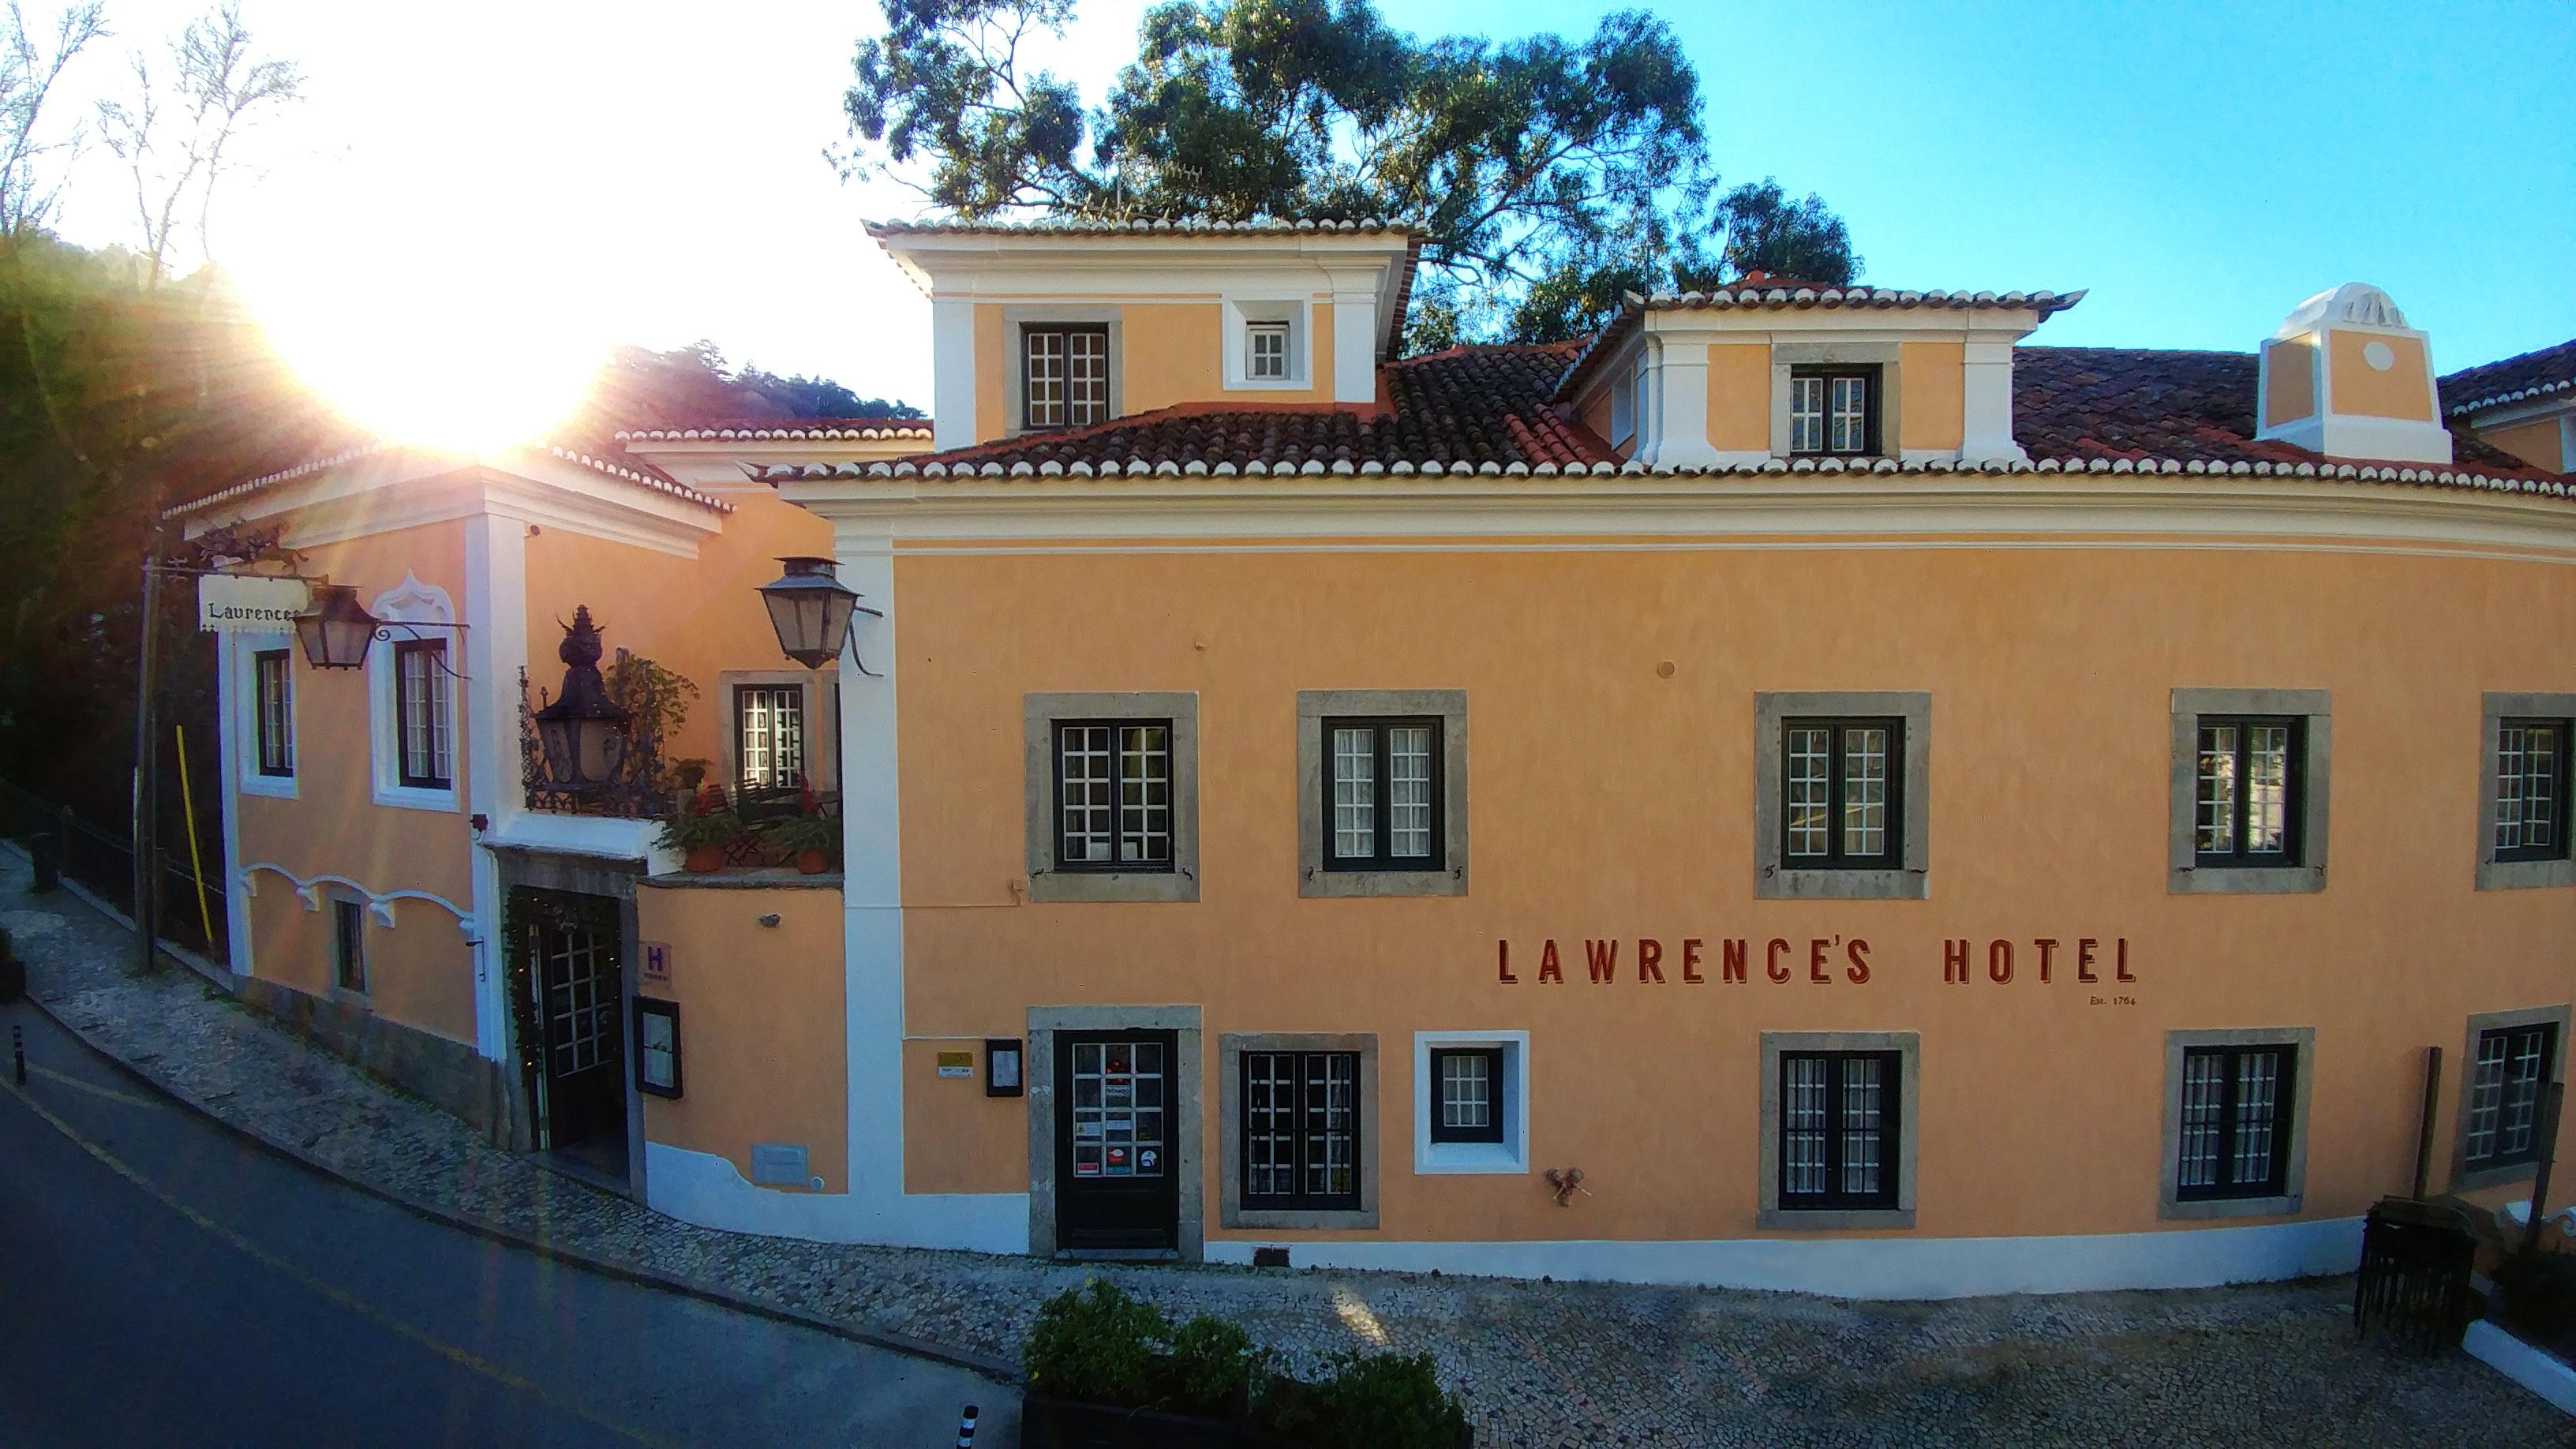 Lawrence's Hotel -2 Nights & Regional Wine Tasting